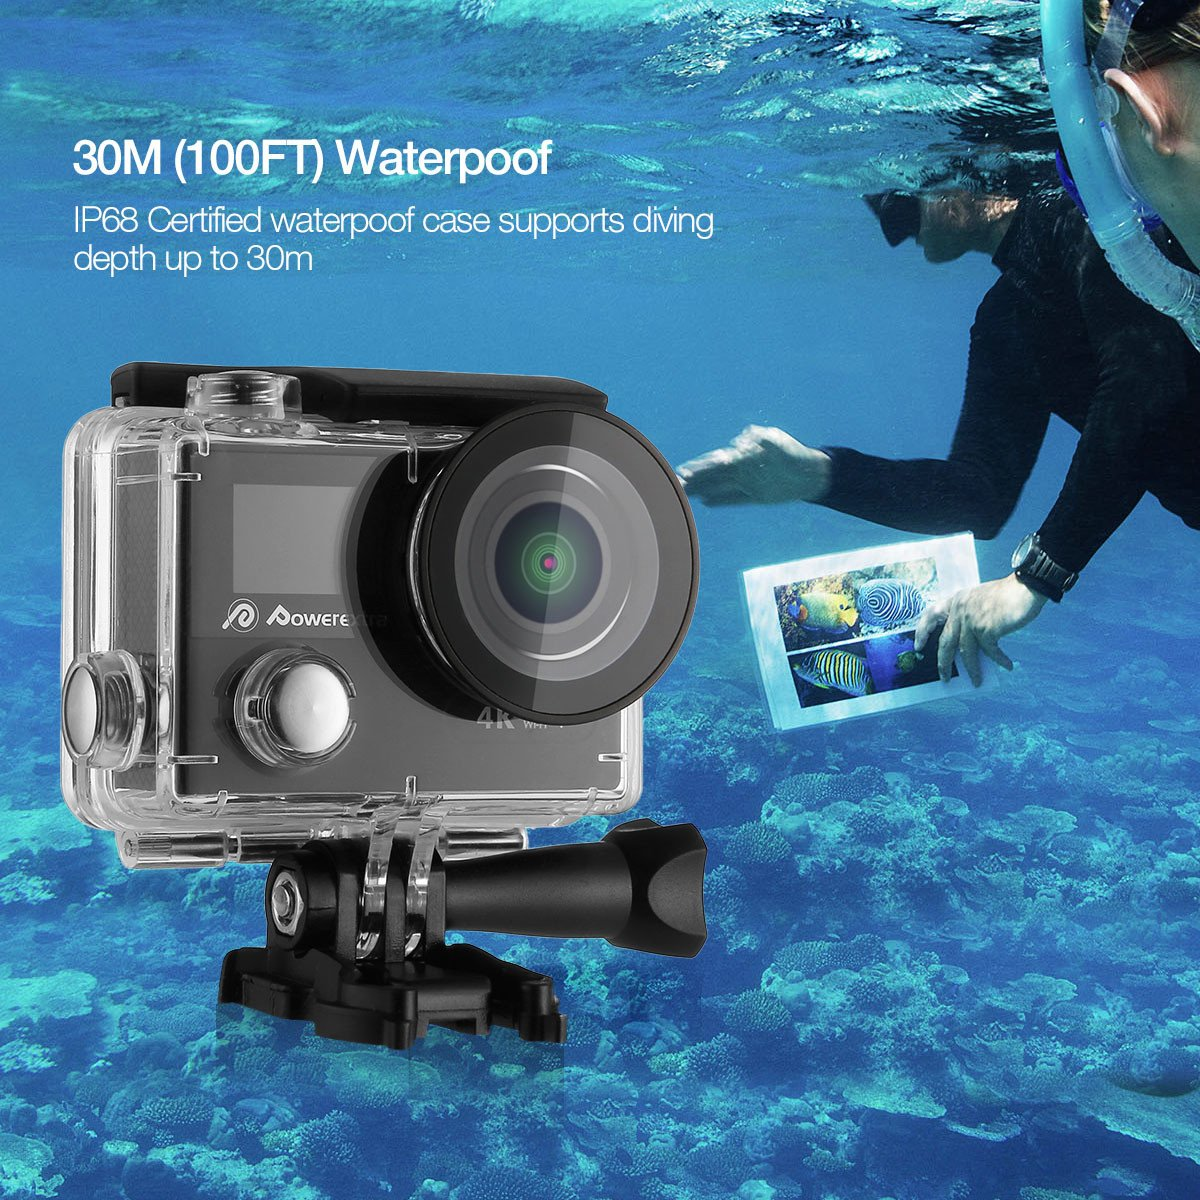 Powerextra Camera Sport 4K Caméra d'Action Ultra HD Caméscope Casque Imperméable /2 Inch Ecran LCD /Grand Angle 170°/12MP & WIFI /Étanche 30M /2.4G Télécommande/19 KITS Accessories